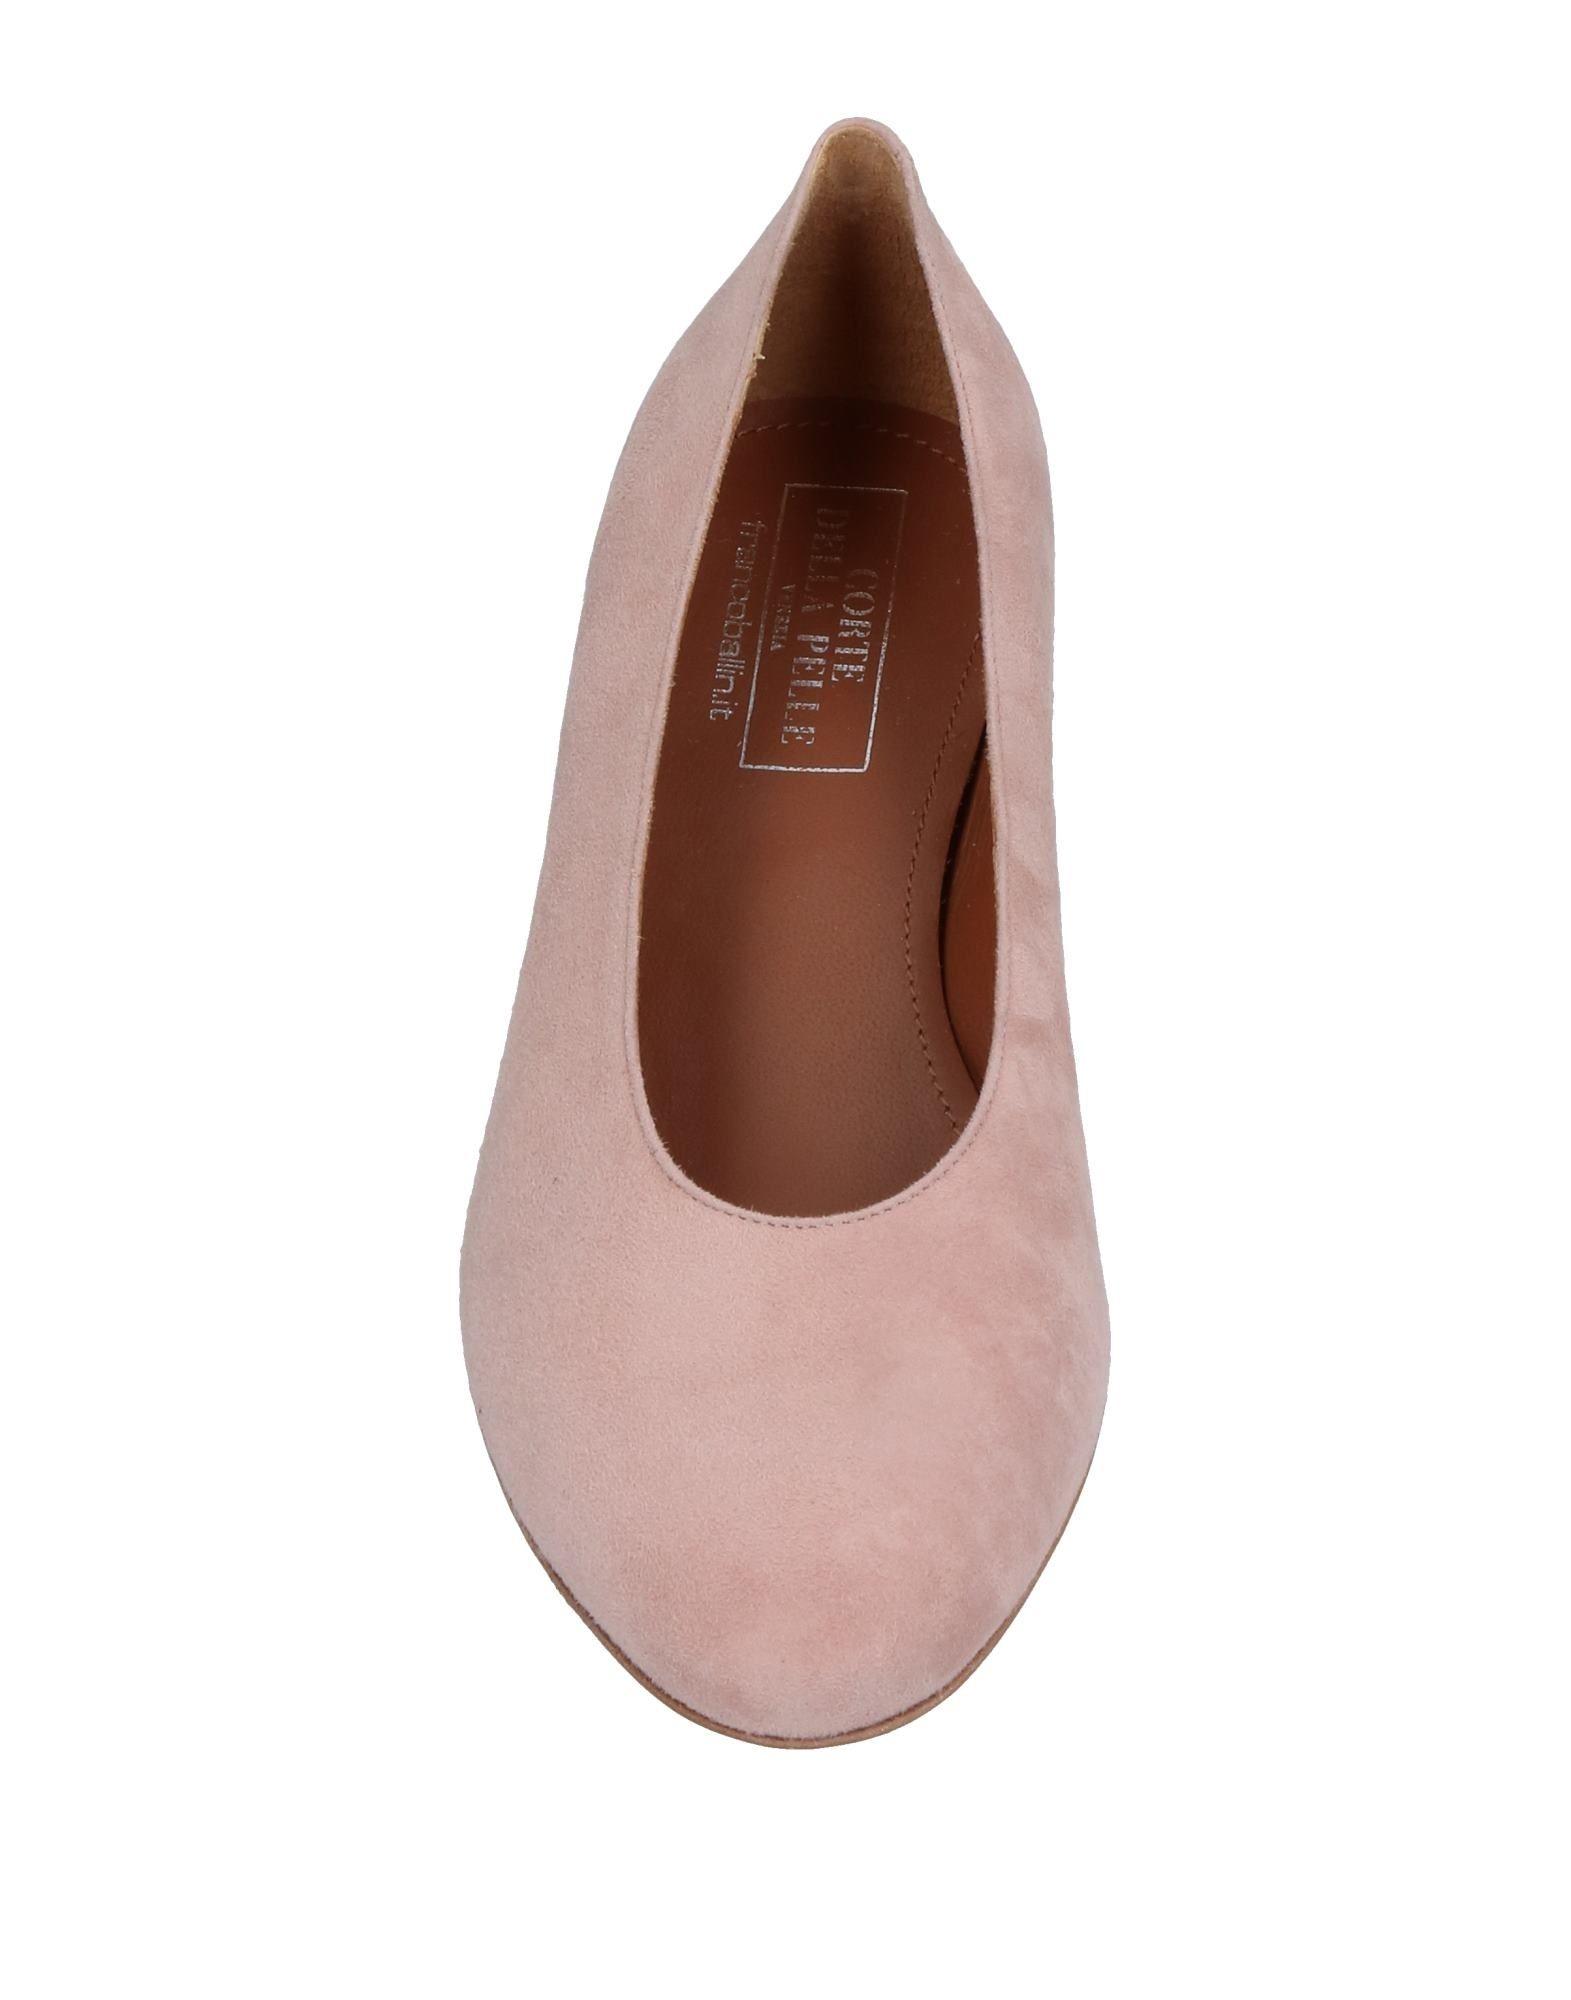 La Corte Della Pelle By Franco Ballin Pumps Damen  11374745OJ Gute Qualität beliebte Schuhe